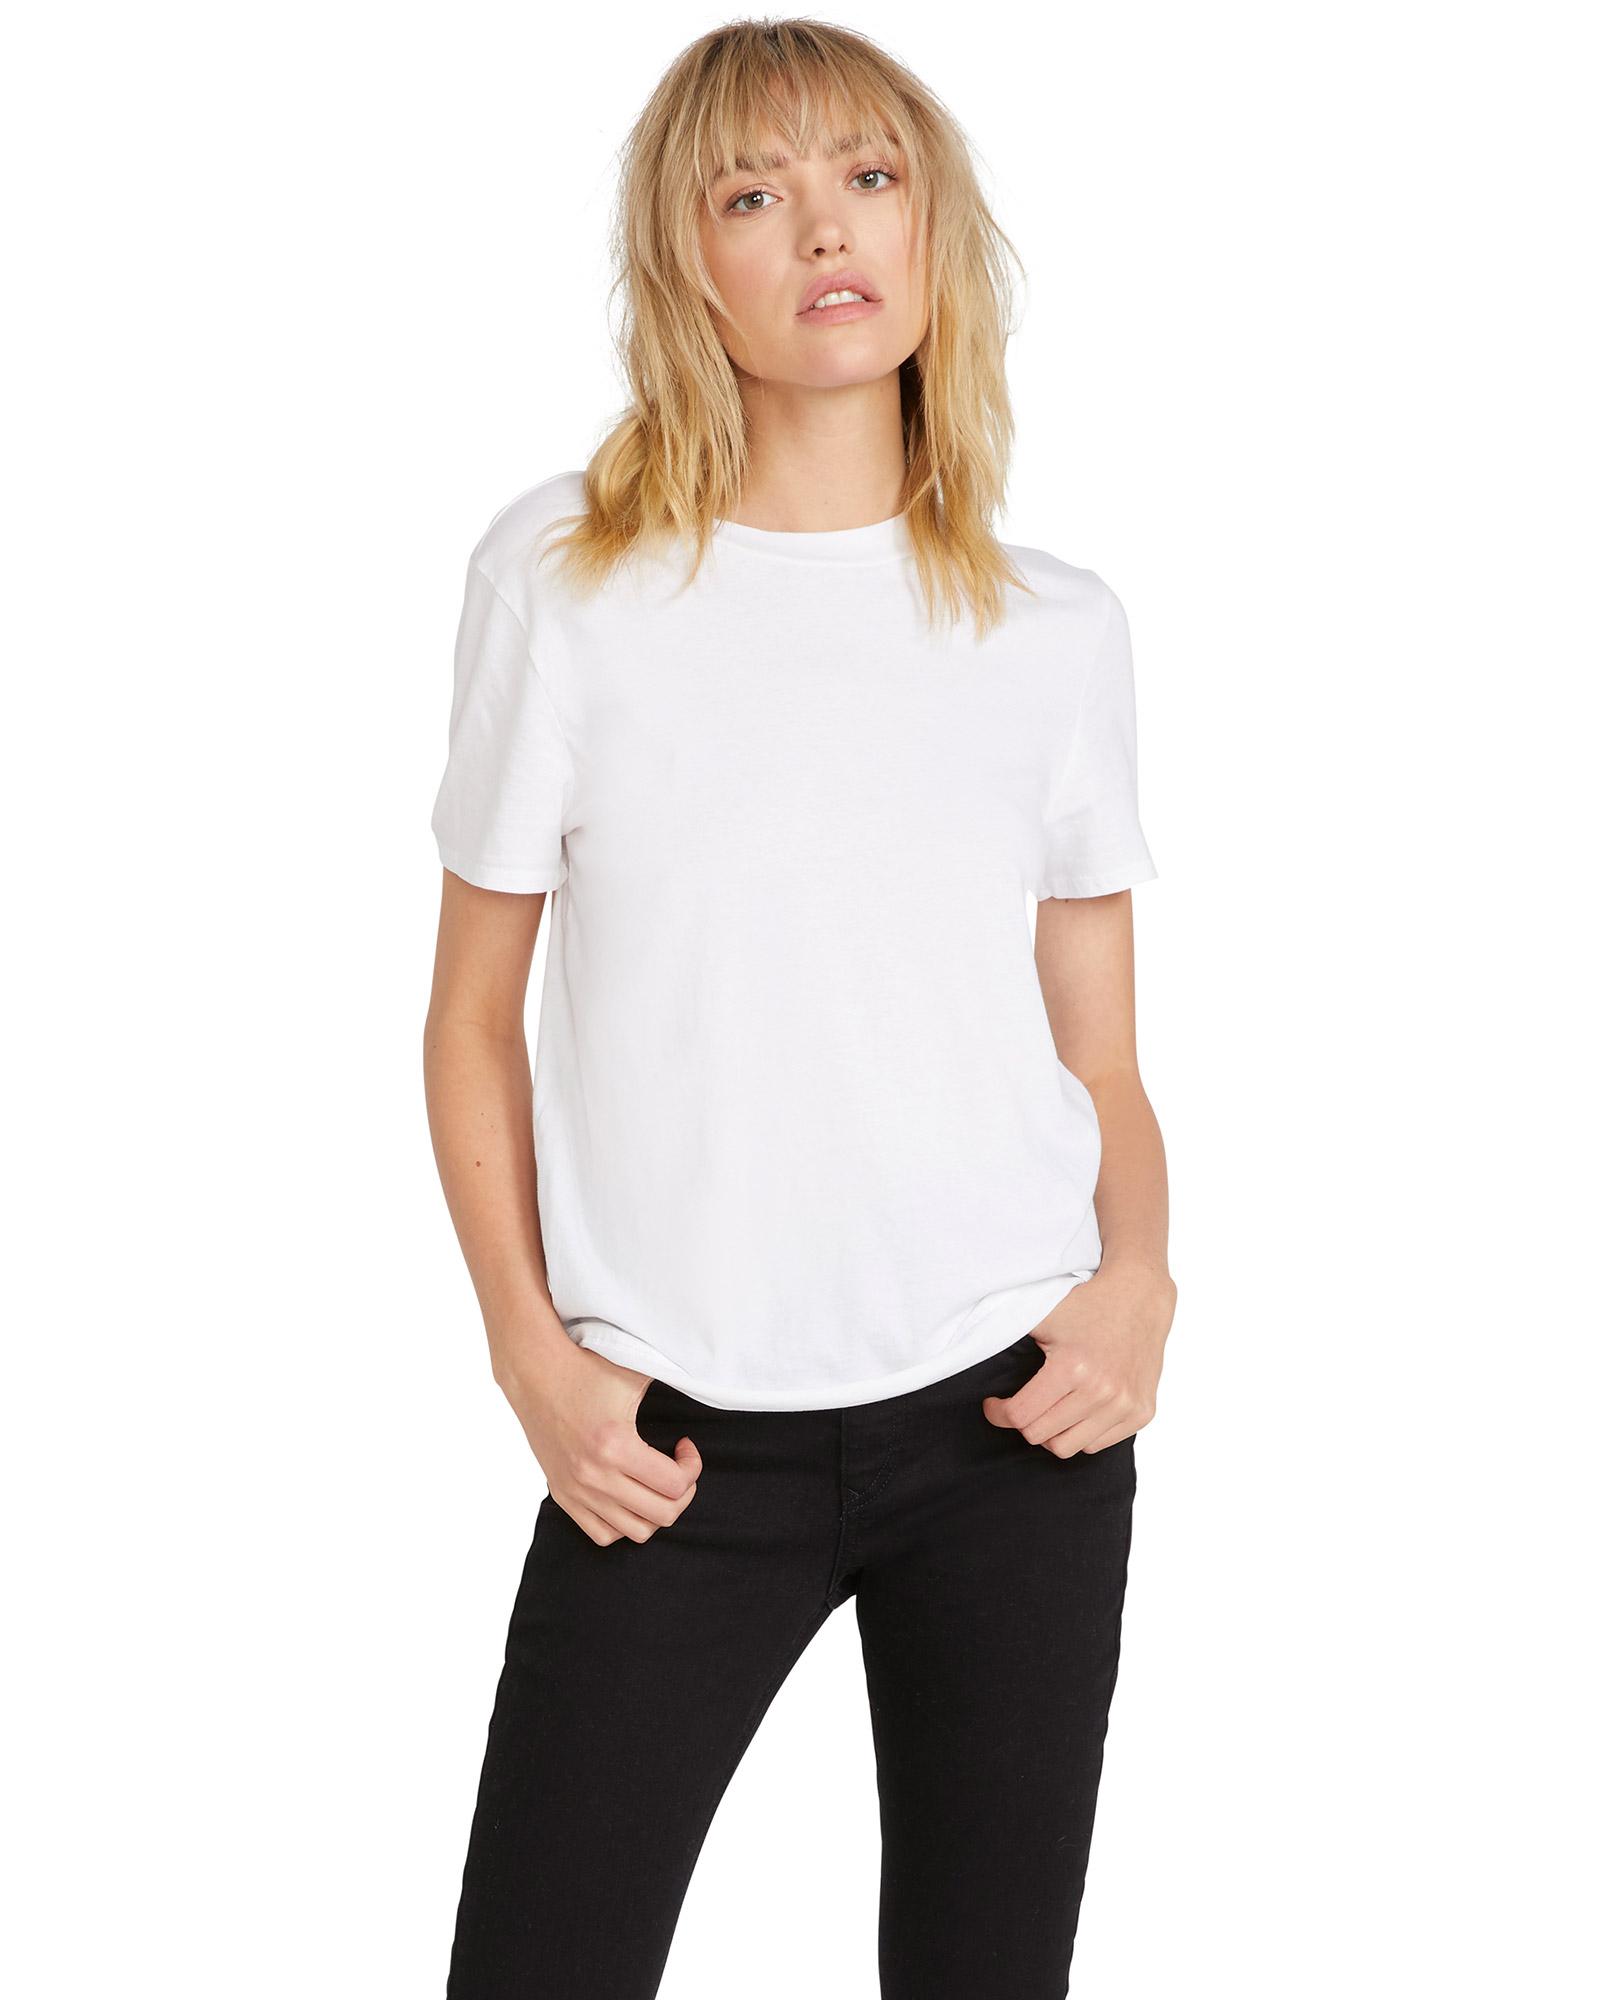 Volcom Women's One of Each BF Short Sleeve T-Shirt 0